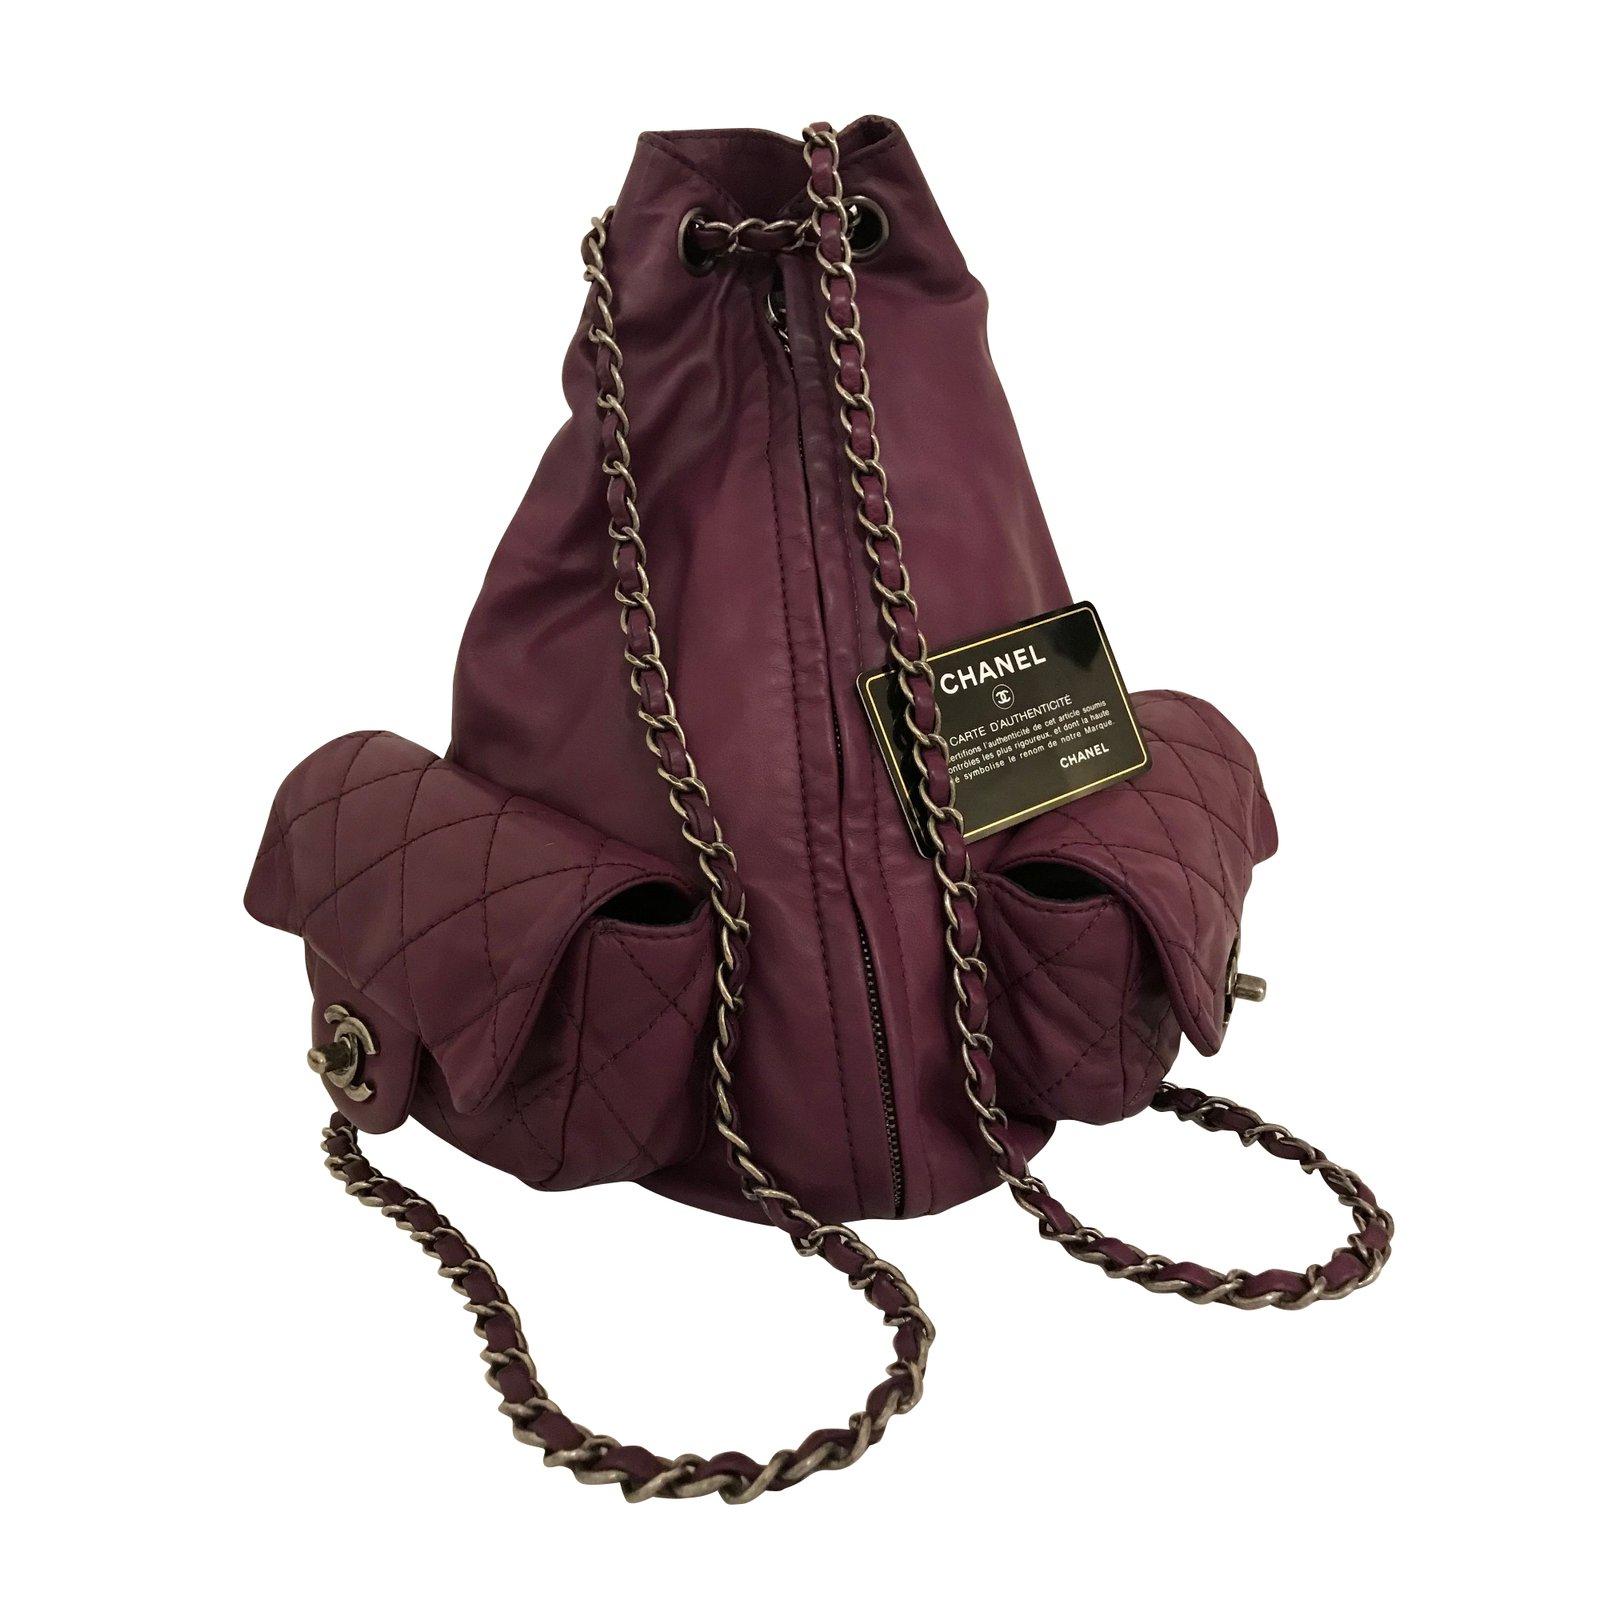 Chanel Lambskin Large Timeless Backpack In Purple Handbags Leather Ref 56873